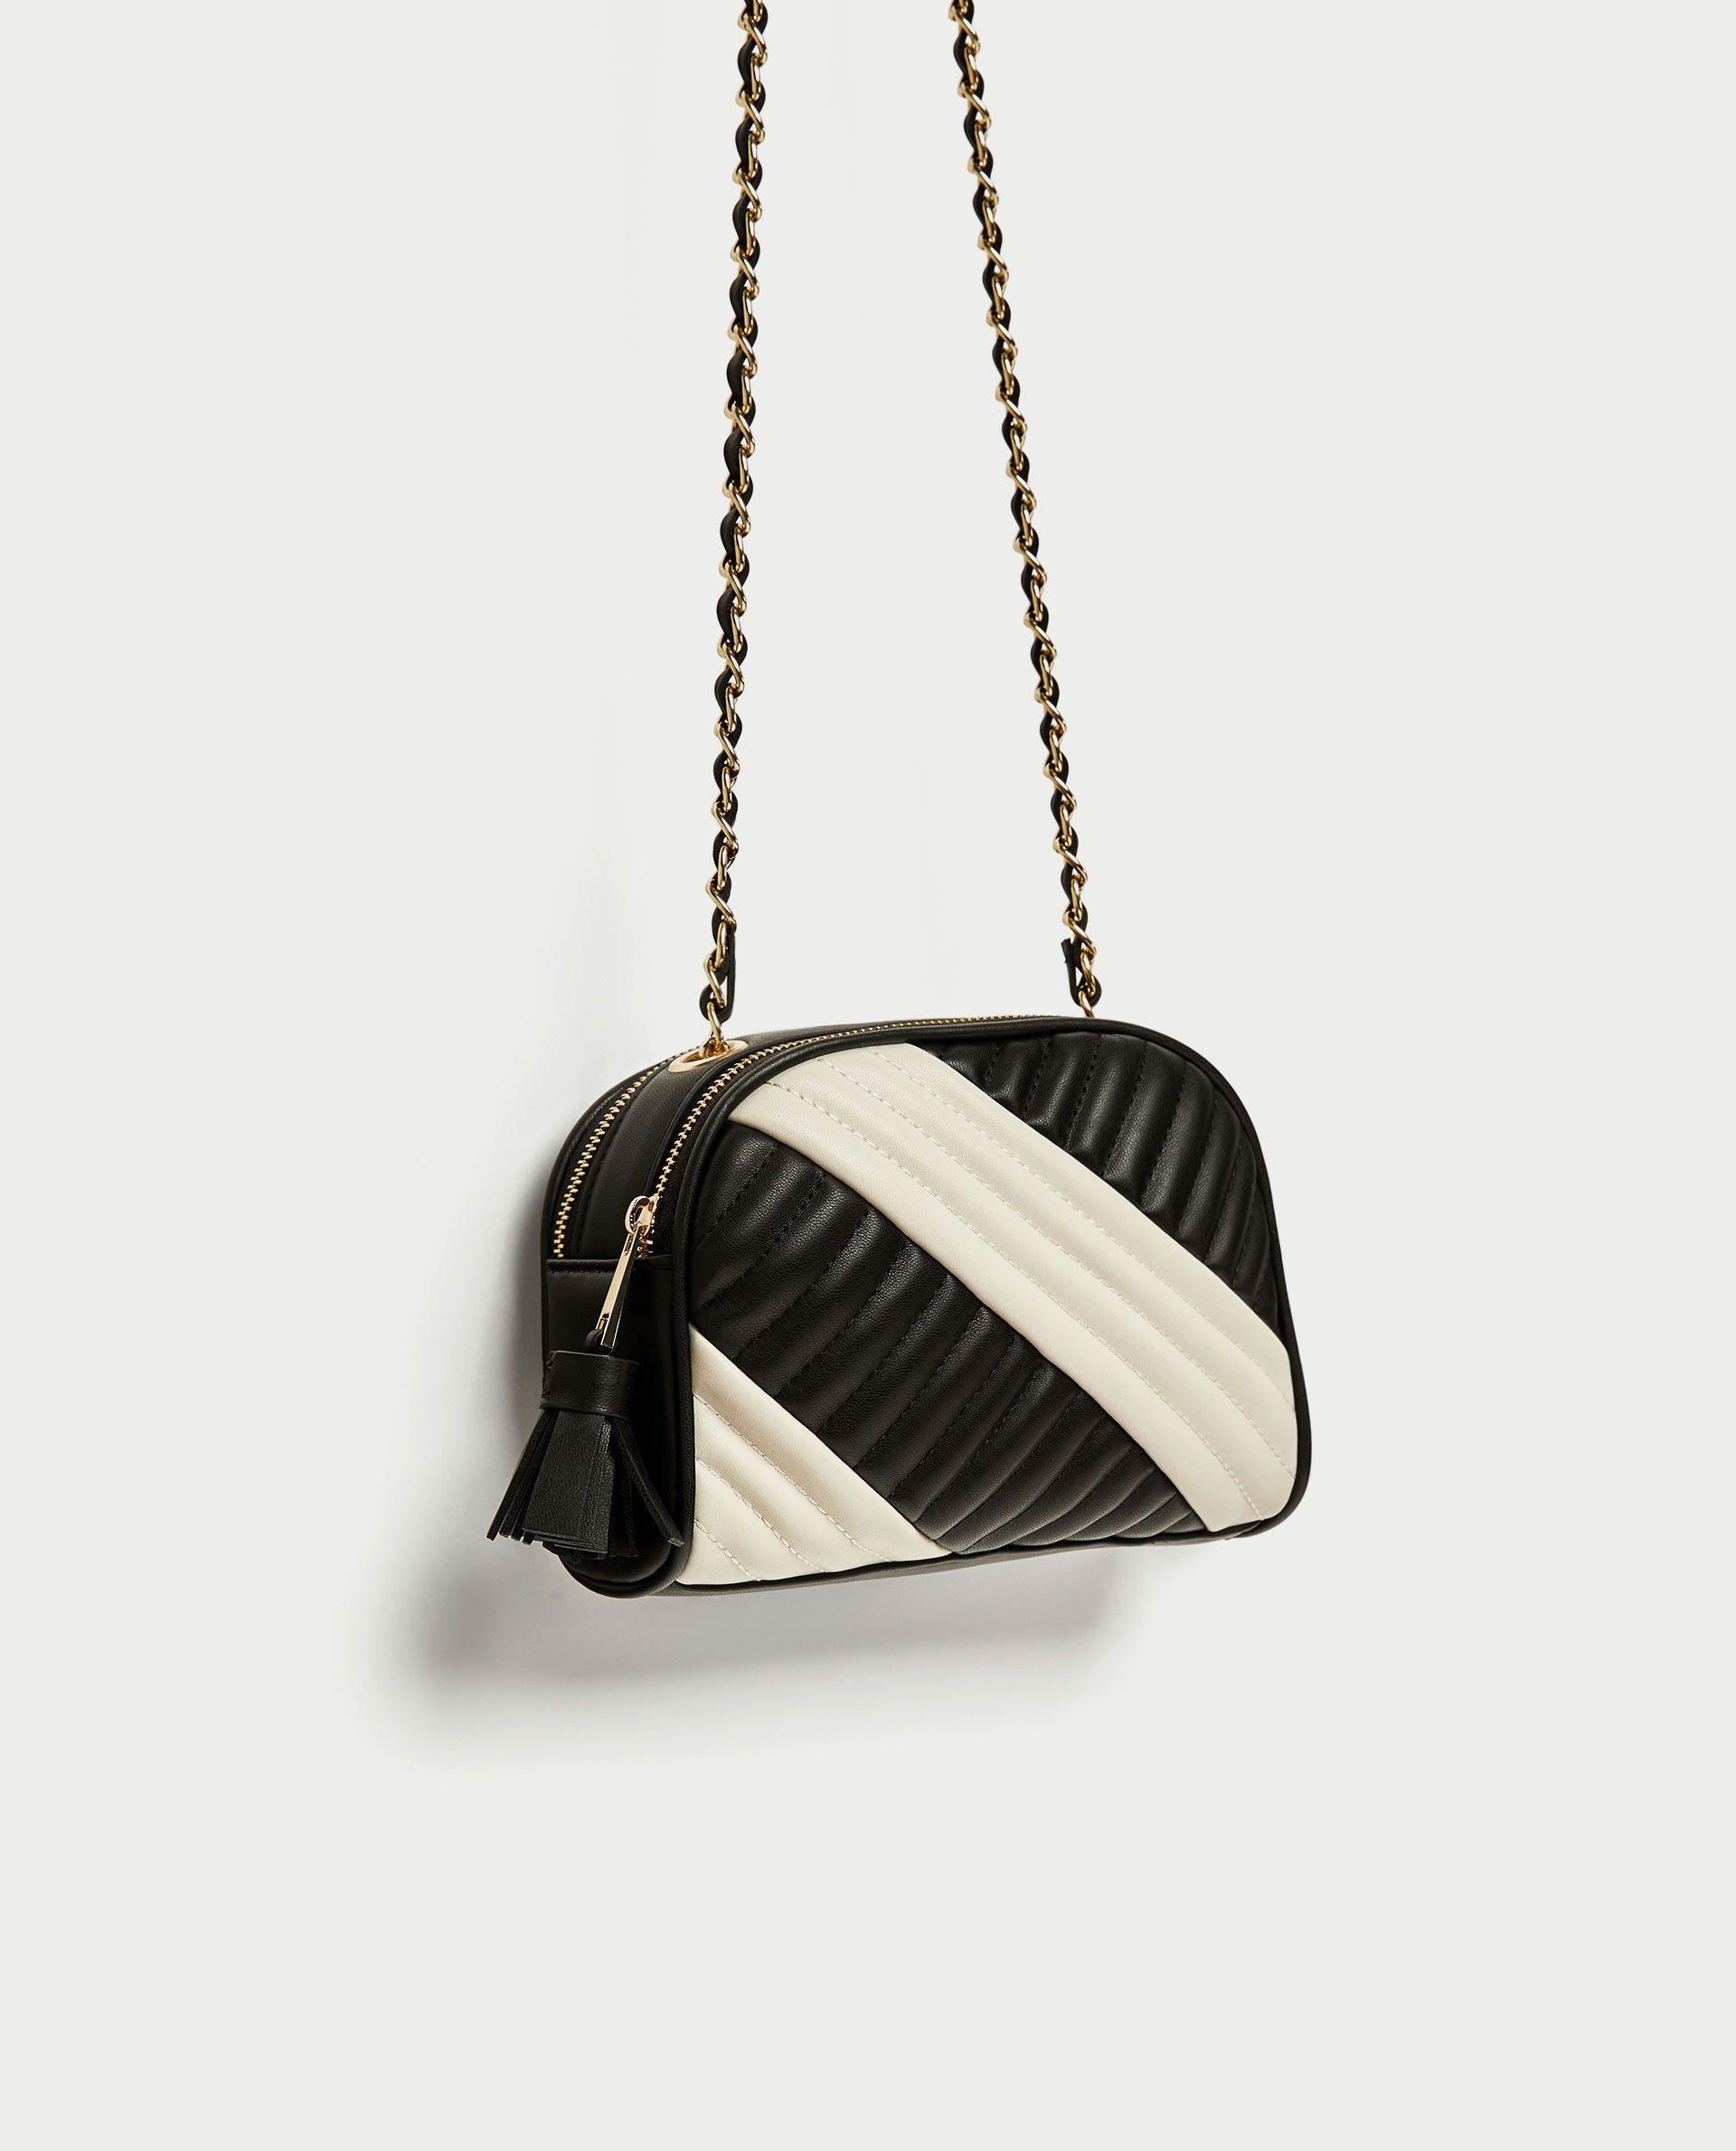 e496c8b7cd BANDOLERA ACOLCHADA BICOLOR | Accessorize | Bags, Crossbody bag ...